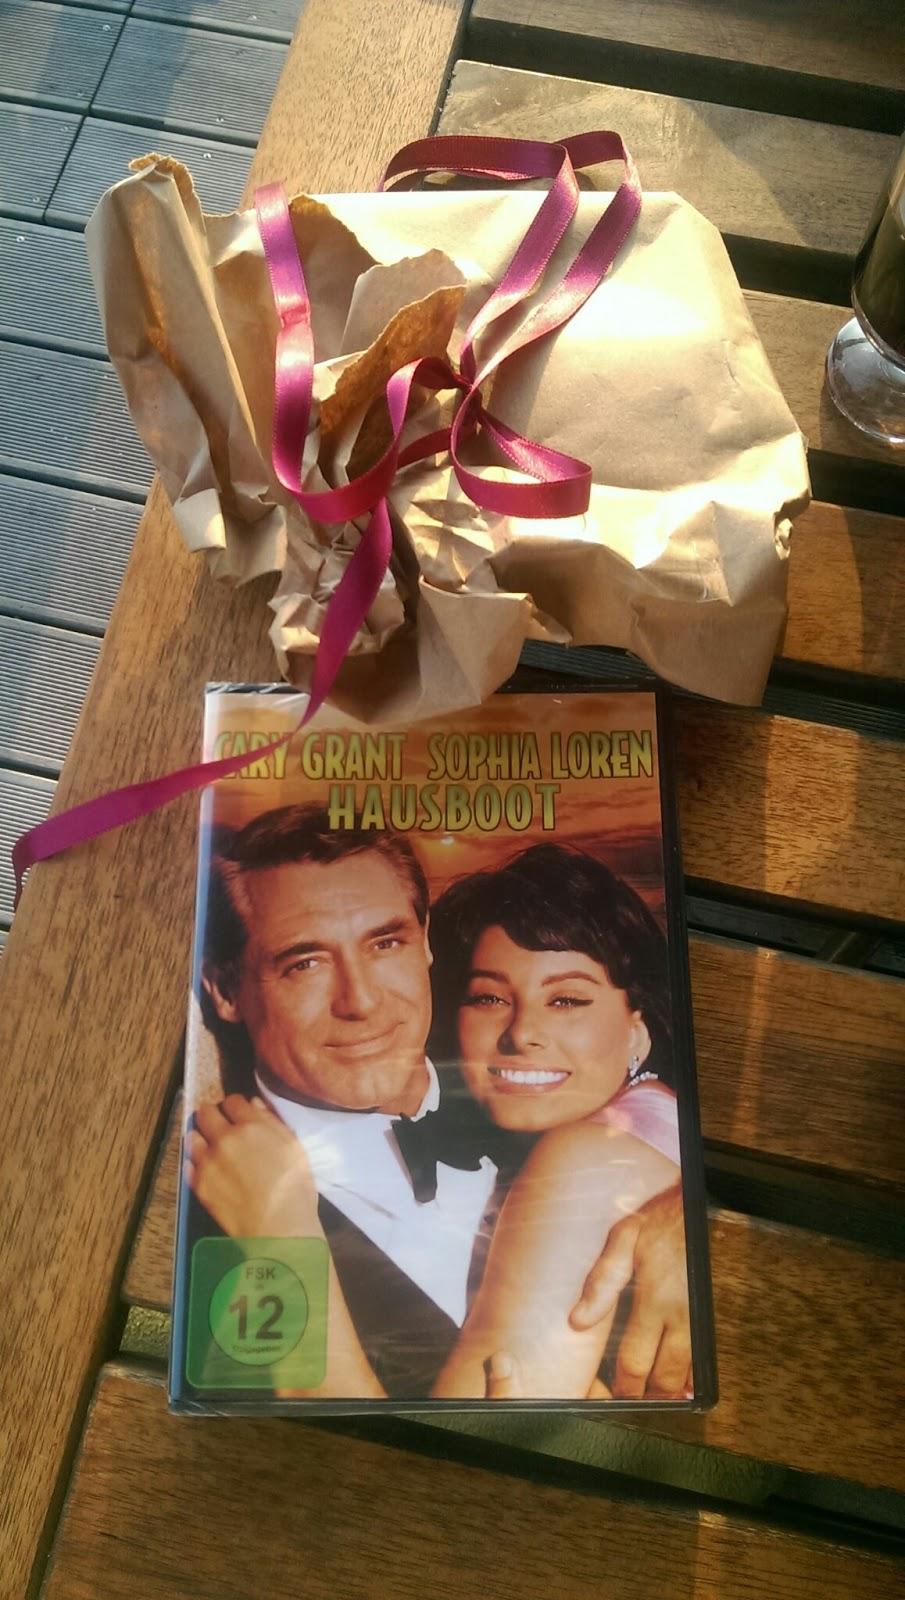 "DVD ""Hausboot"" mit Cary Grant und Sophia Loren | Arthurs Tochter Kocht by Astrid Paul"